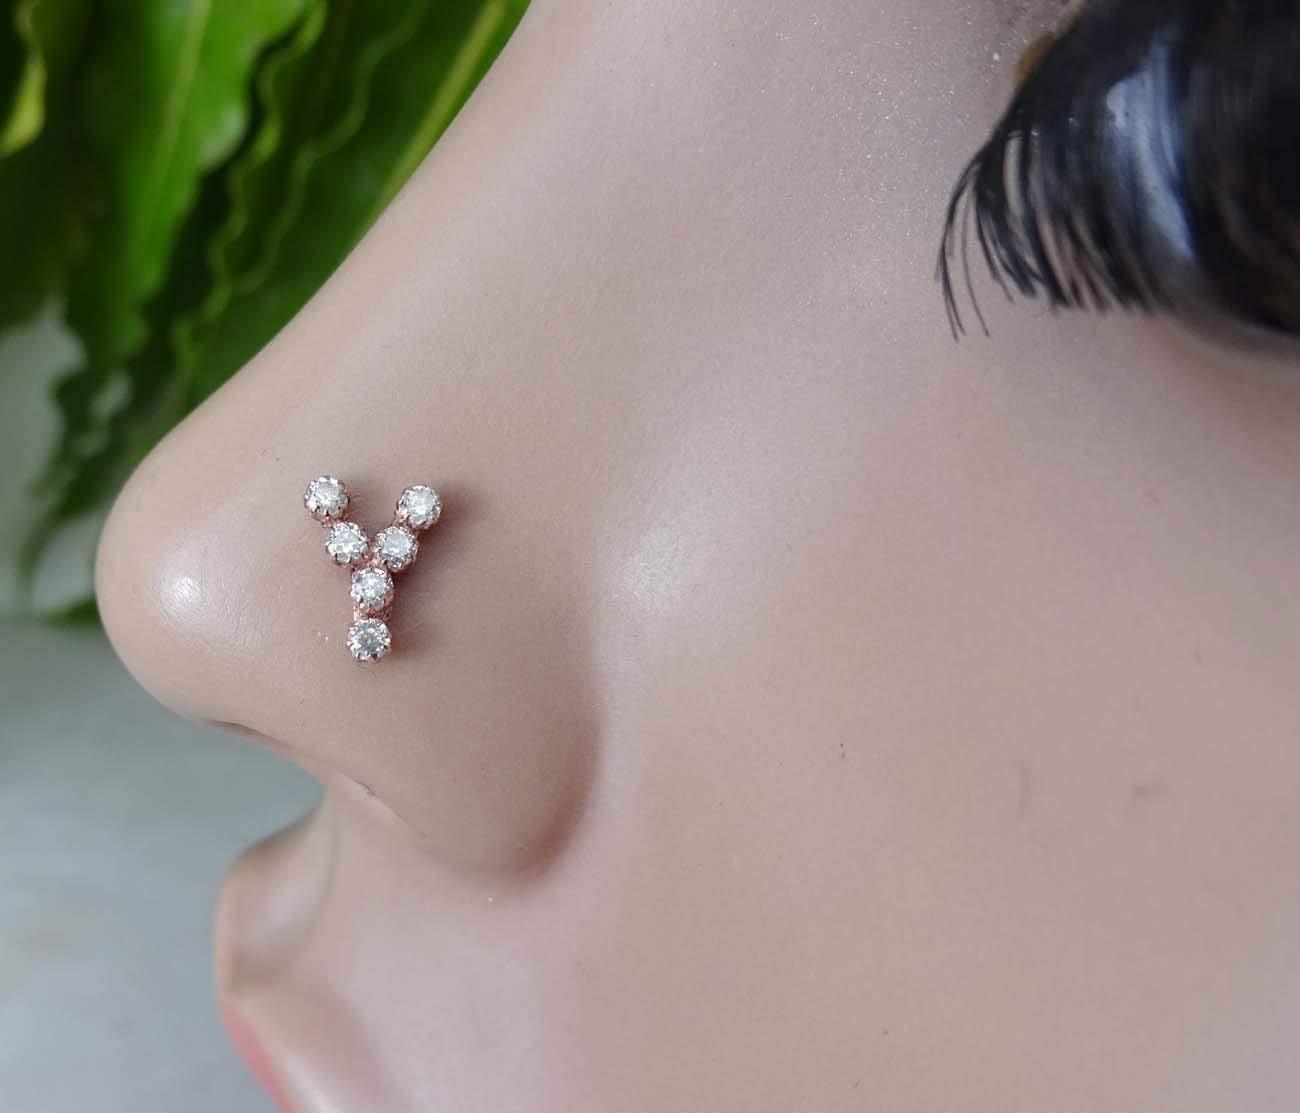 Alphabet Piercing,Indian Nose Stud,14K Gold Piercing,Crock Screw Nose Stud,Nose Piercing,Personalized Nose Stud,Sterling Silver Personalized Initial Piercing,Opal Nose Ring(TEJ483)